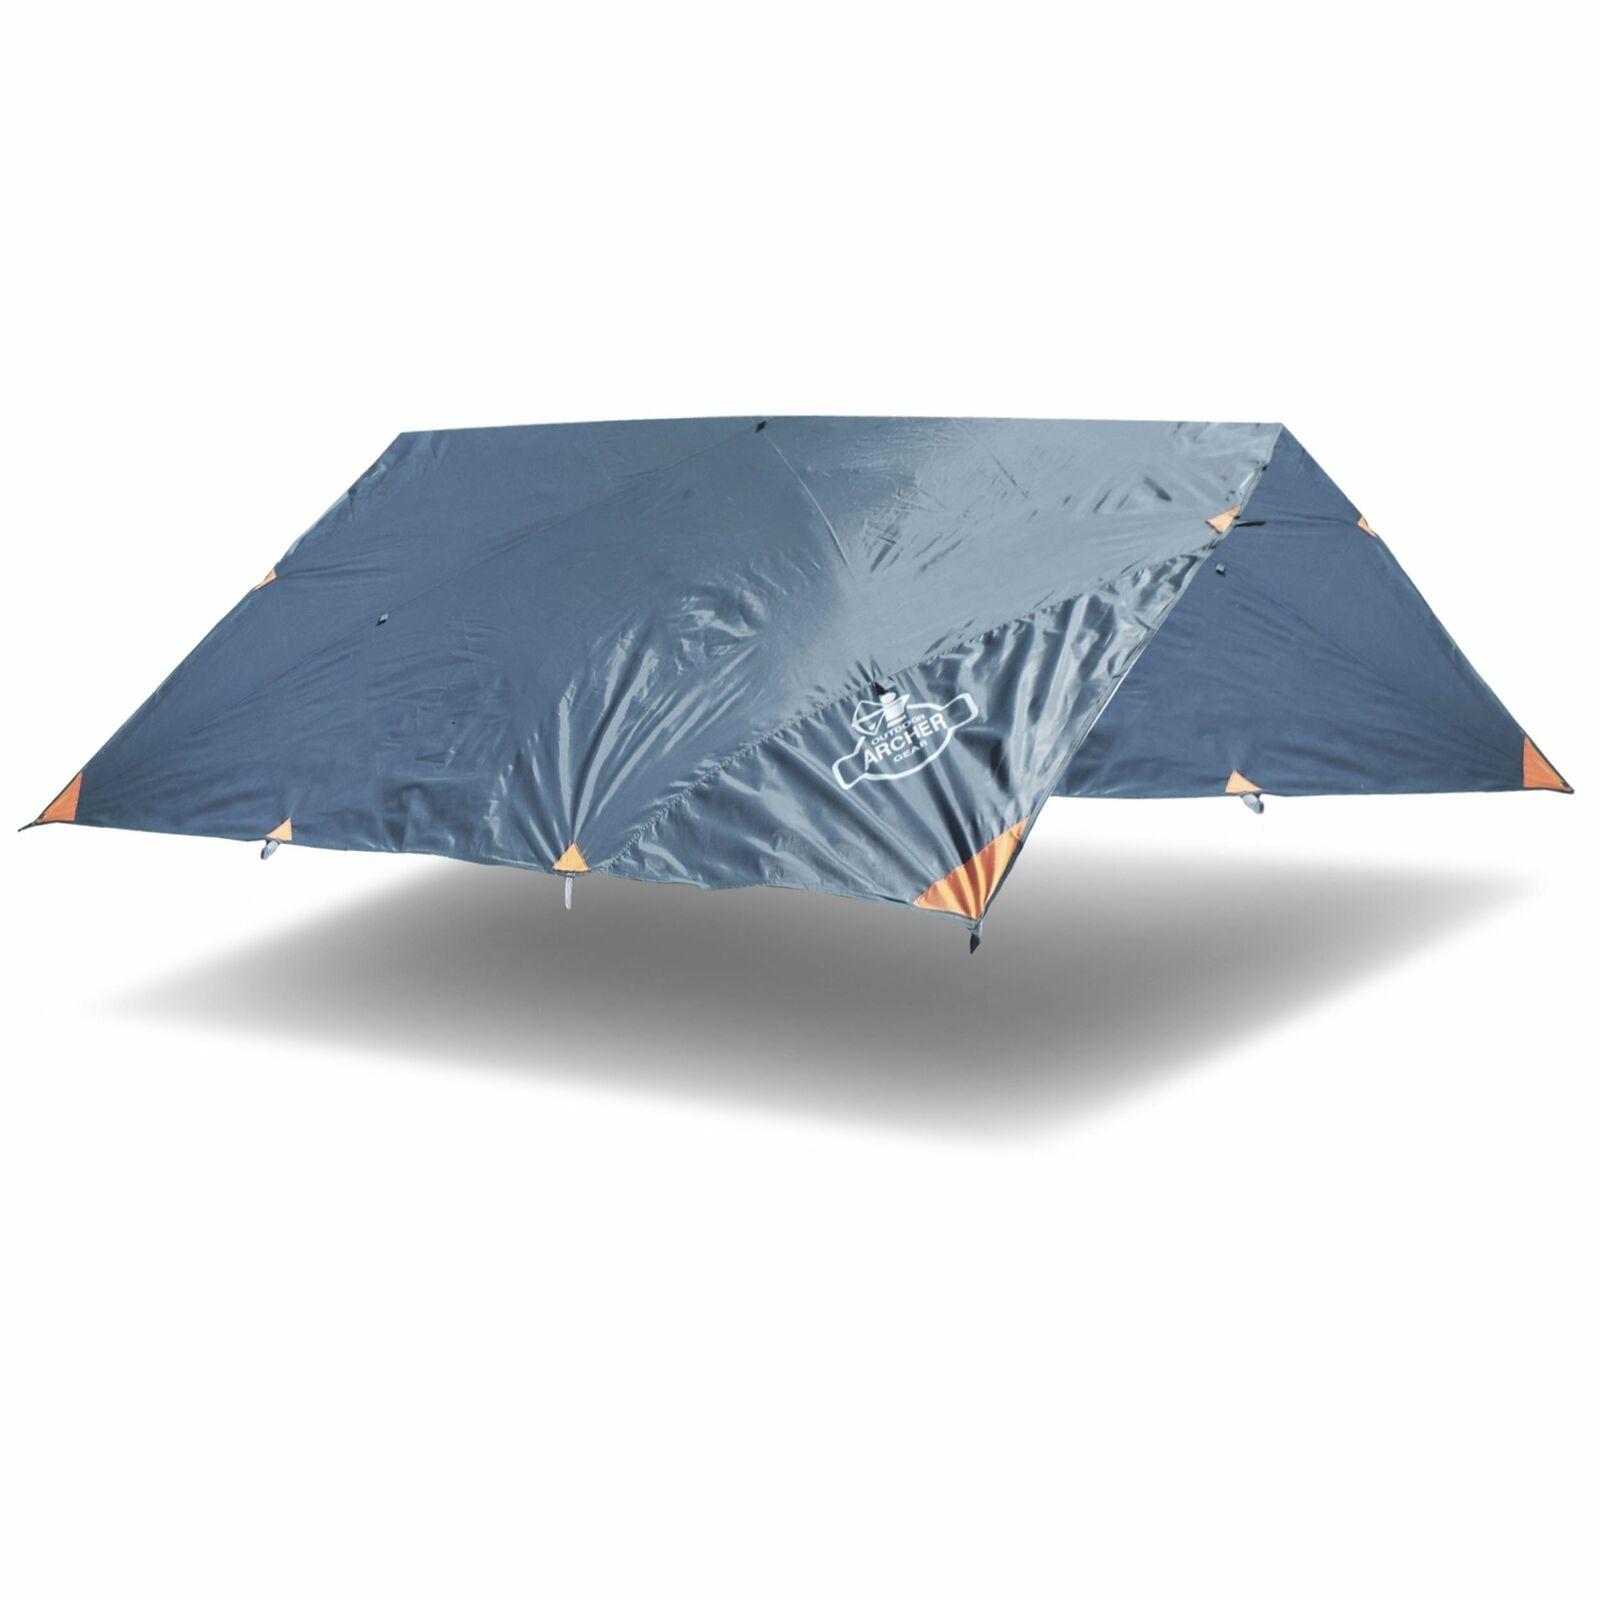 Archer Outdoor Gear All-Weather Sturdy Waterproof Rain & Fly Camping Tarp